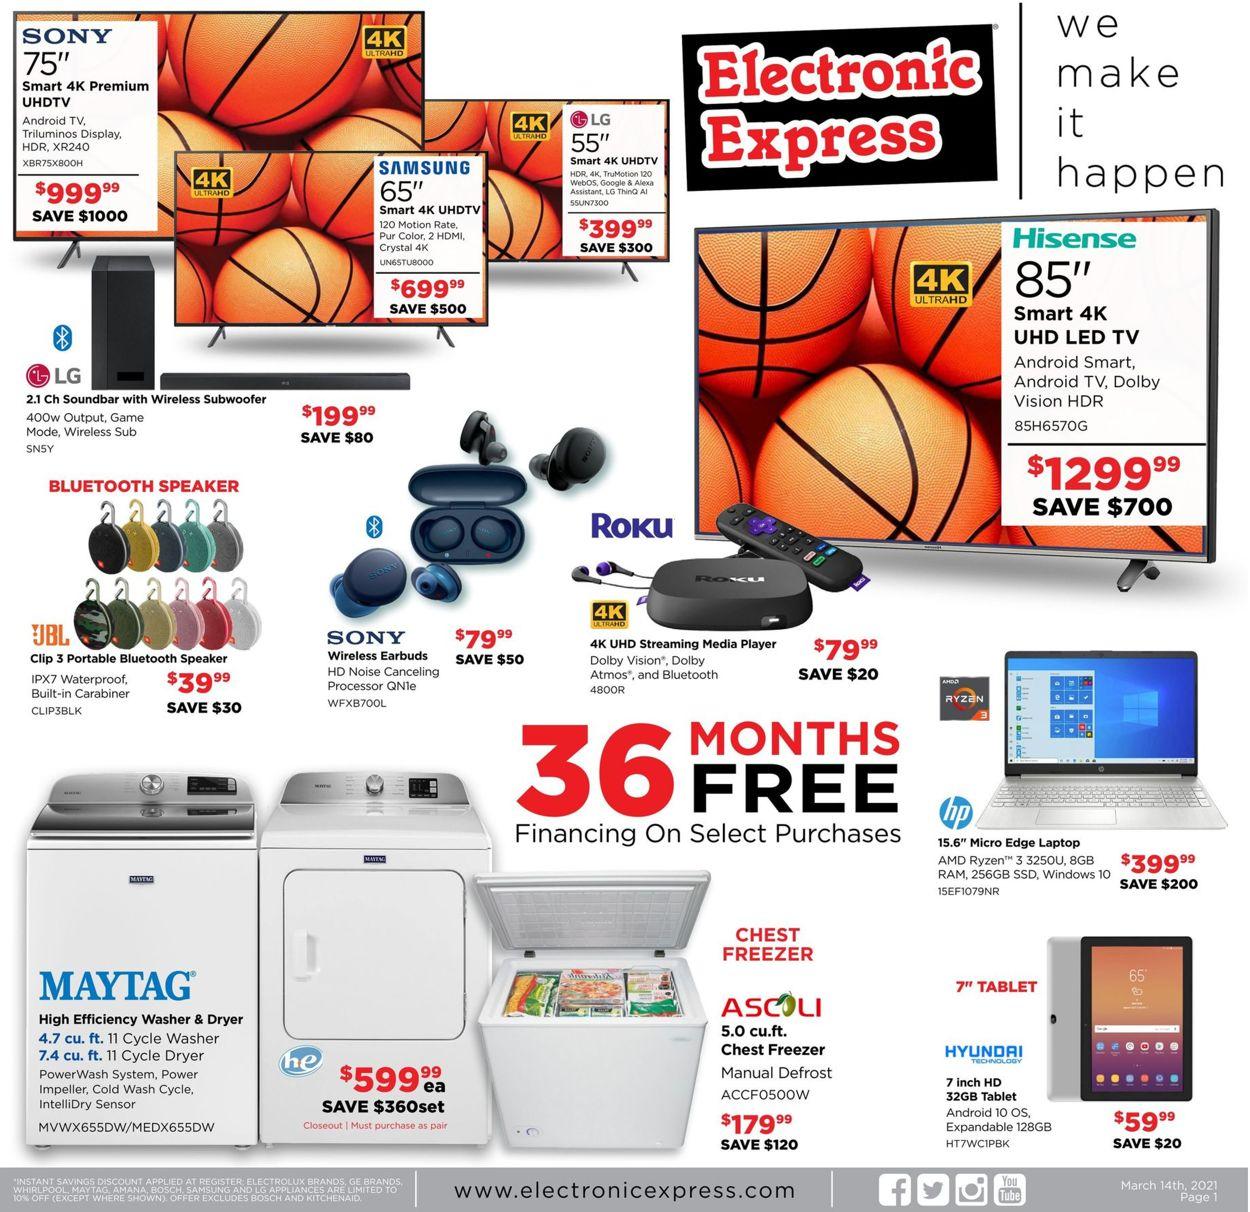 Electronic Express Weekly Ad Circular - valid 03/14-03/20/2021